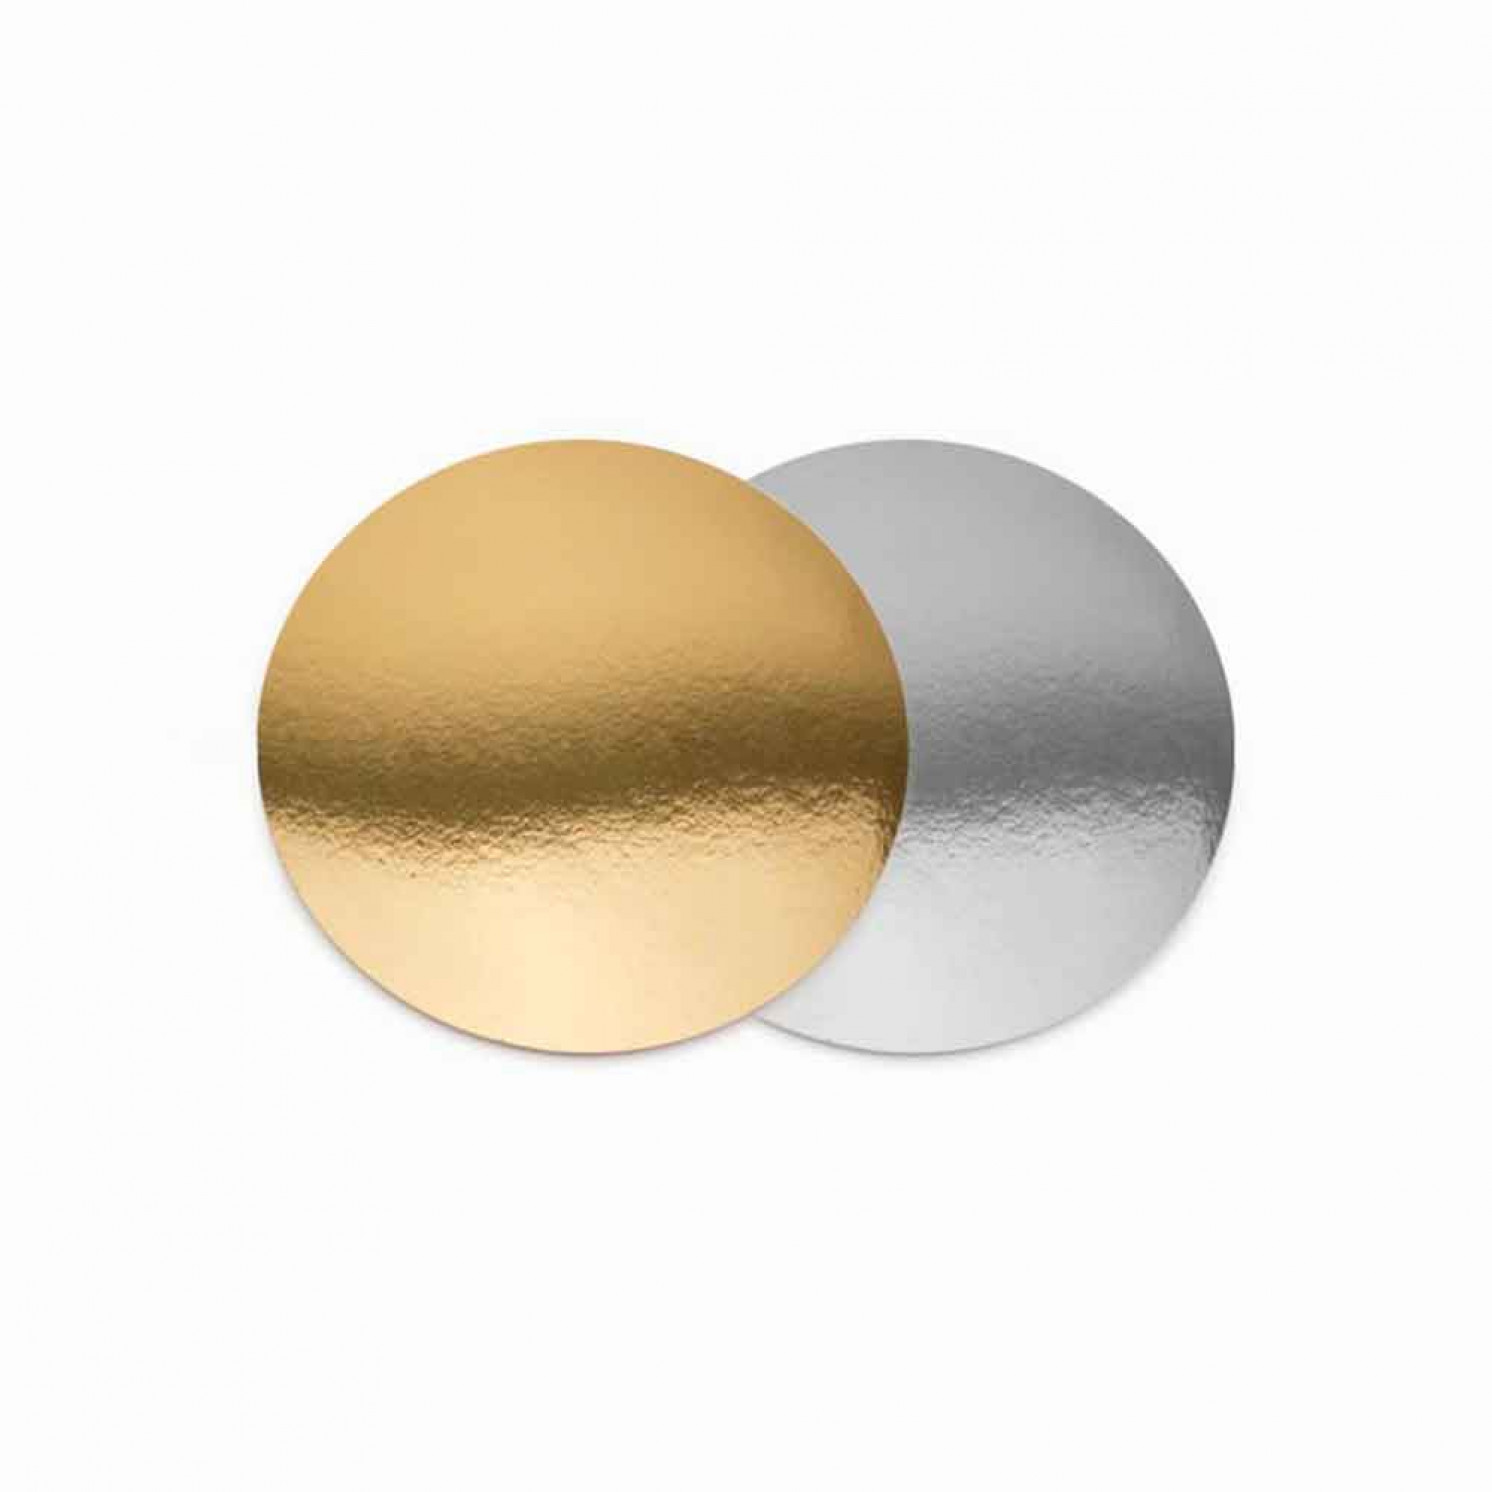 Подложка золото/серебро D300 мм (Толщина 0,8 мм)